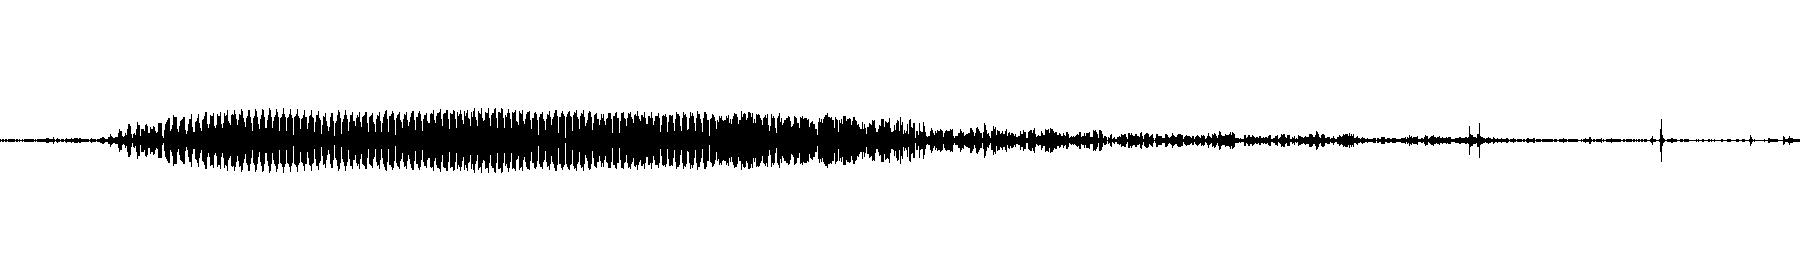 fx 12